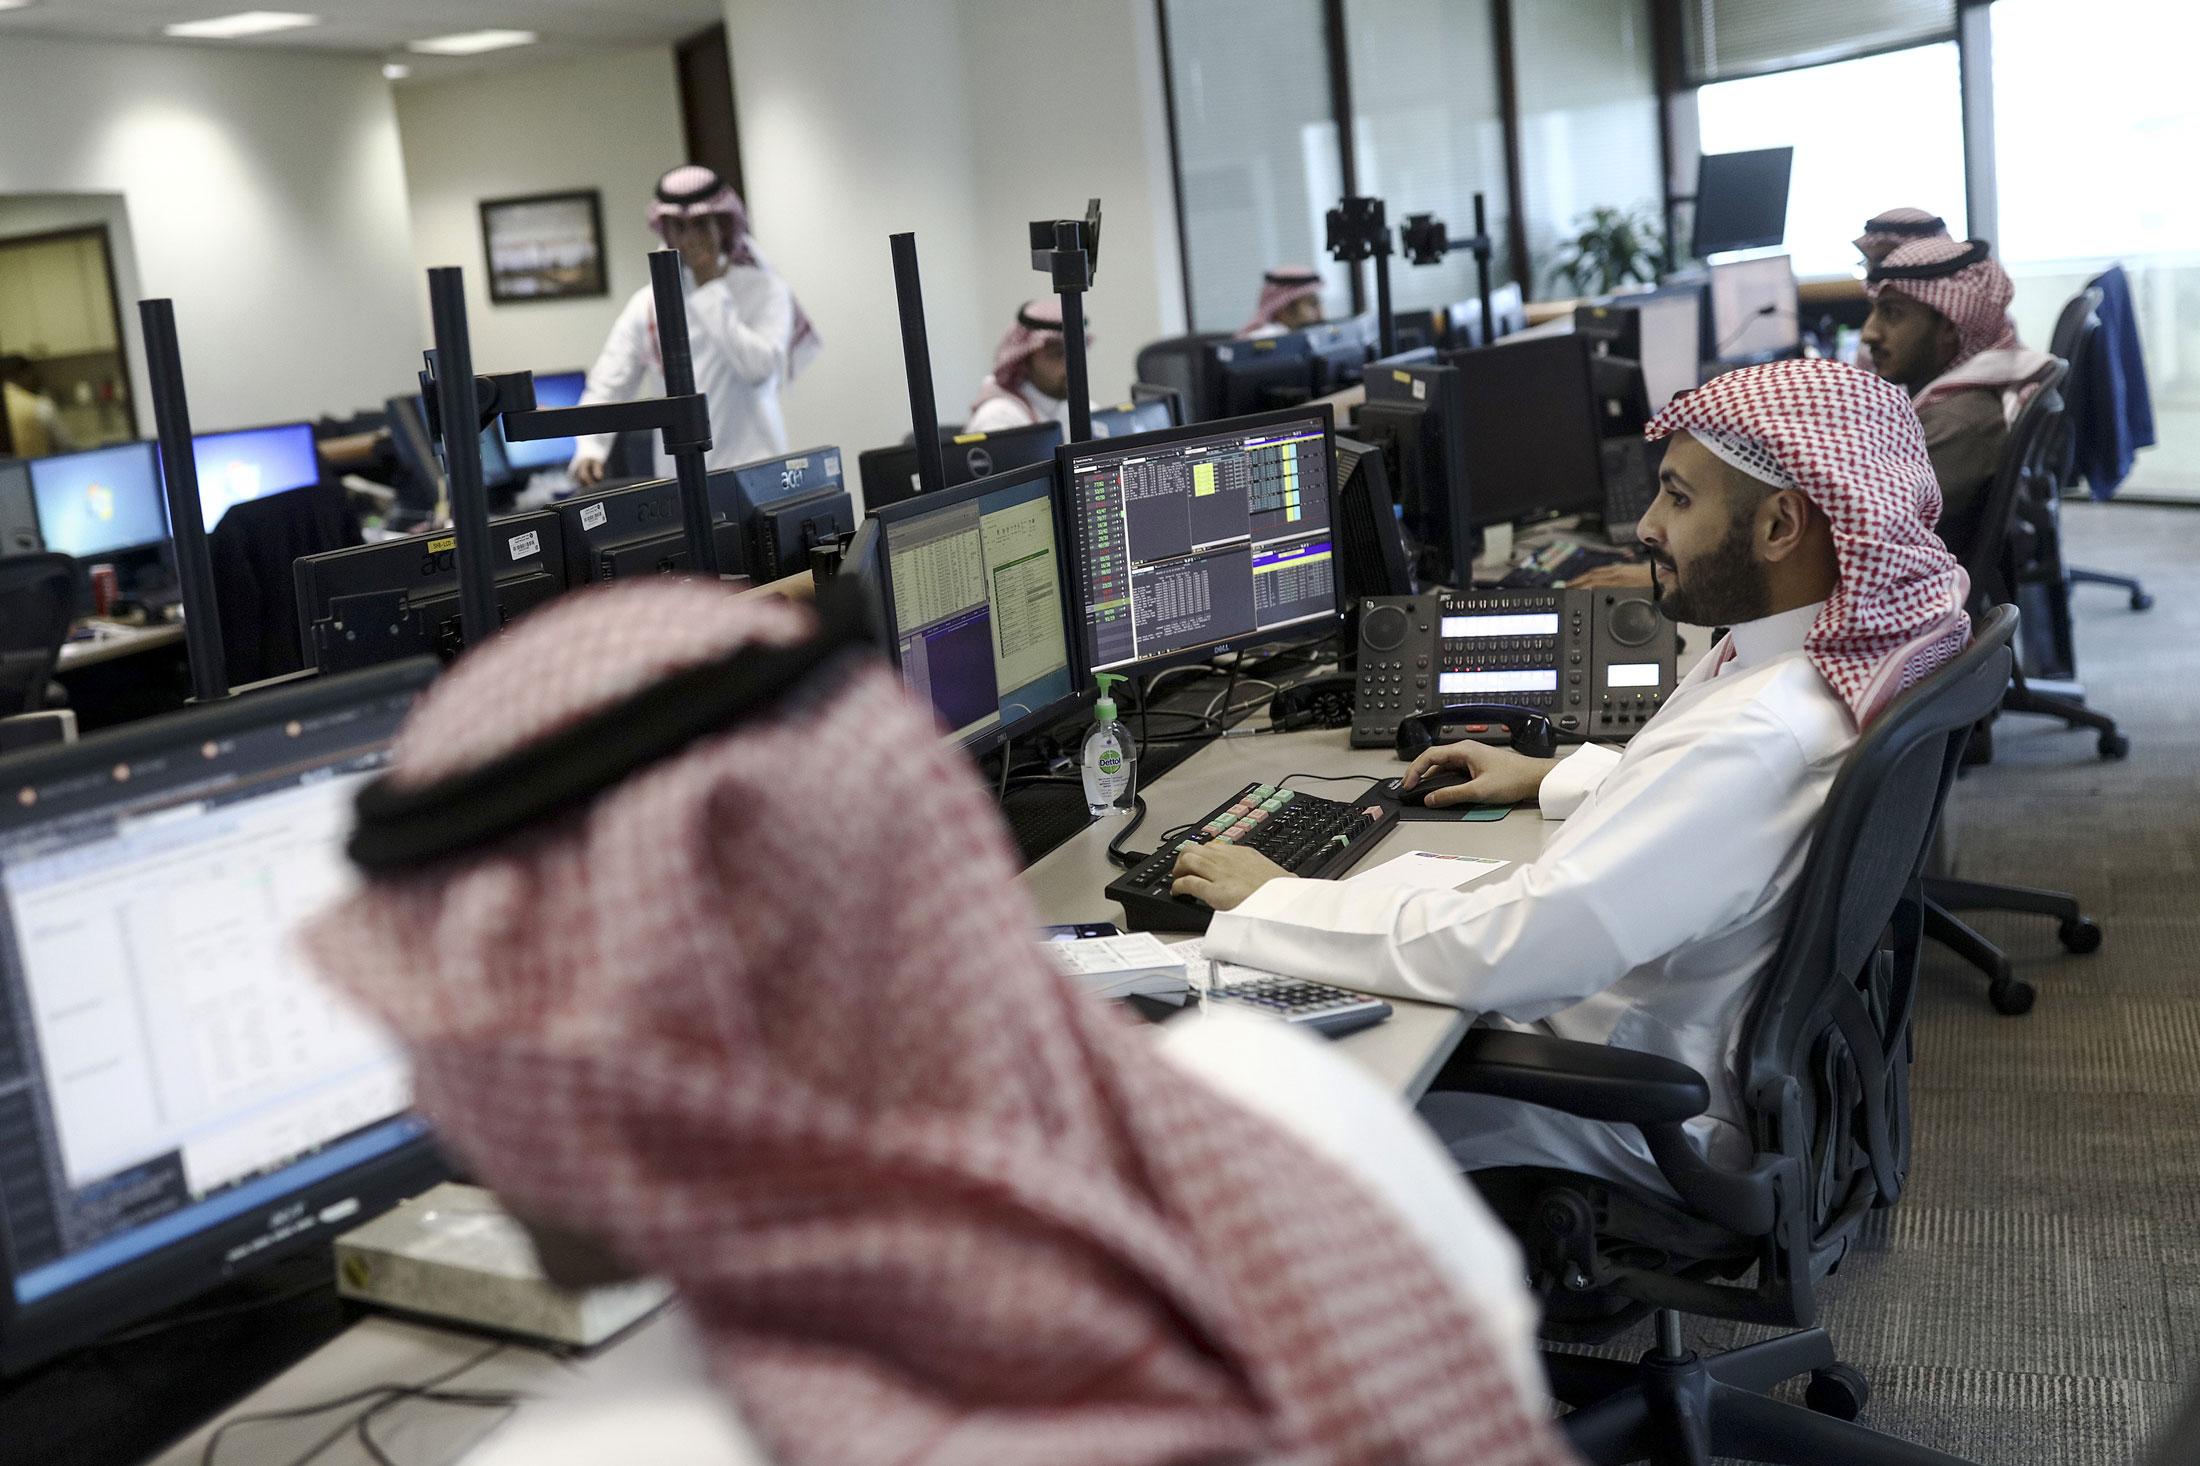 Help Wanted in Saudi Arabia: Savvy Investors